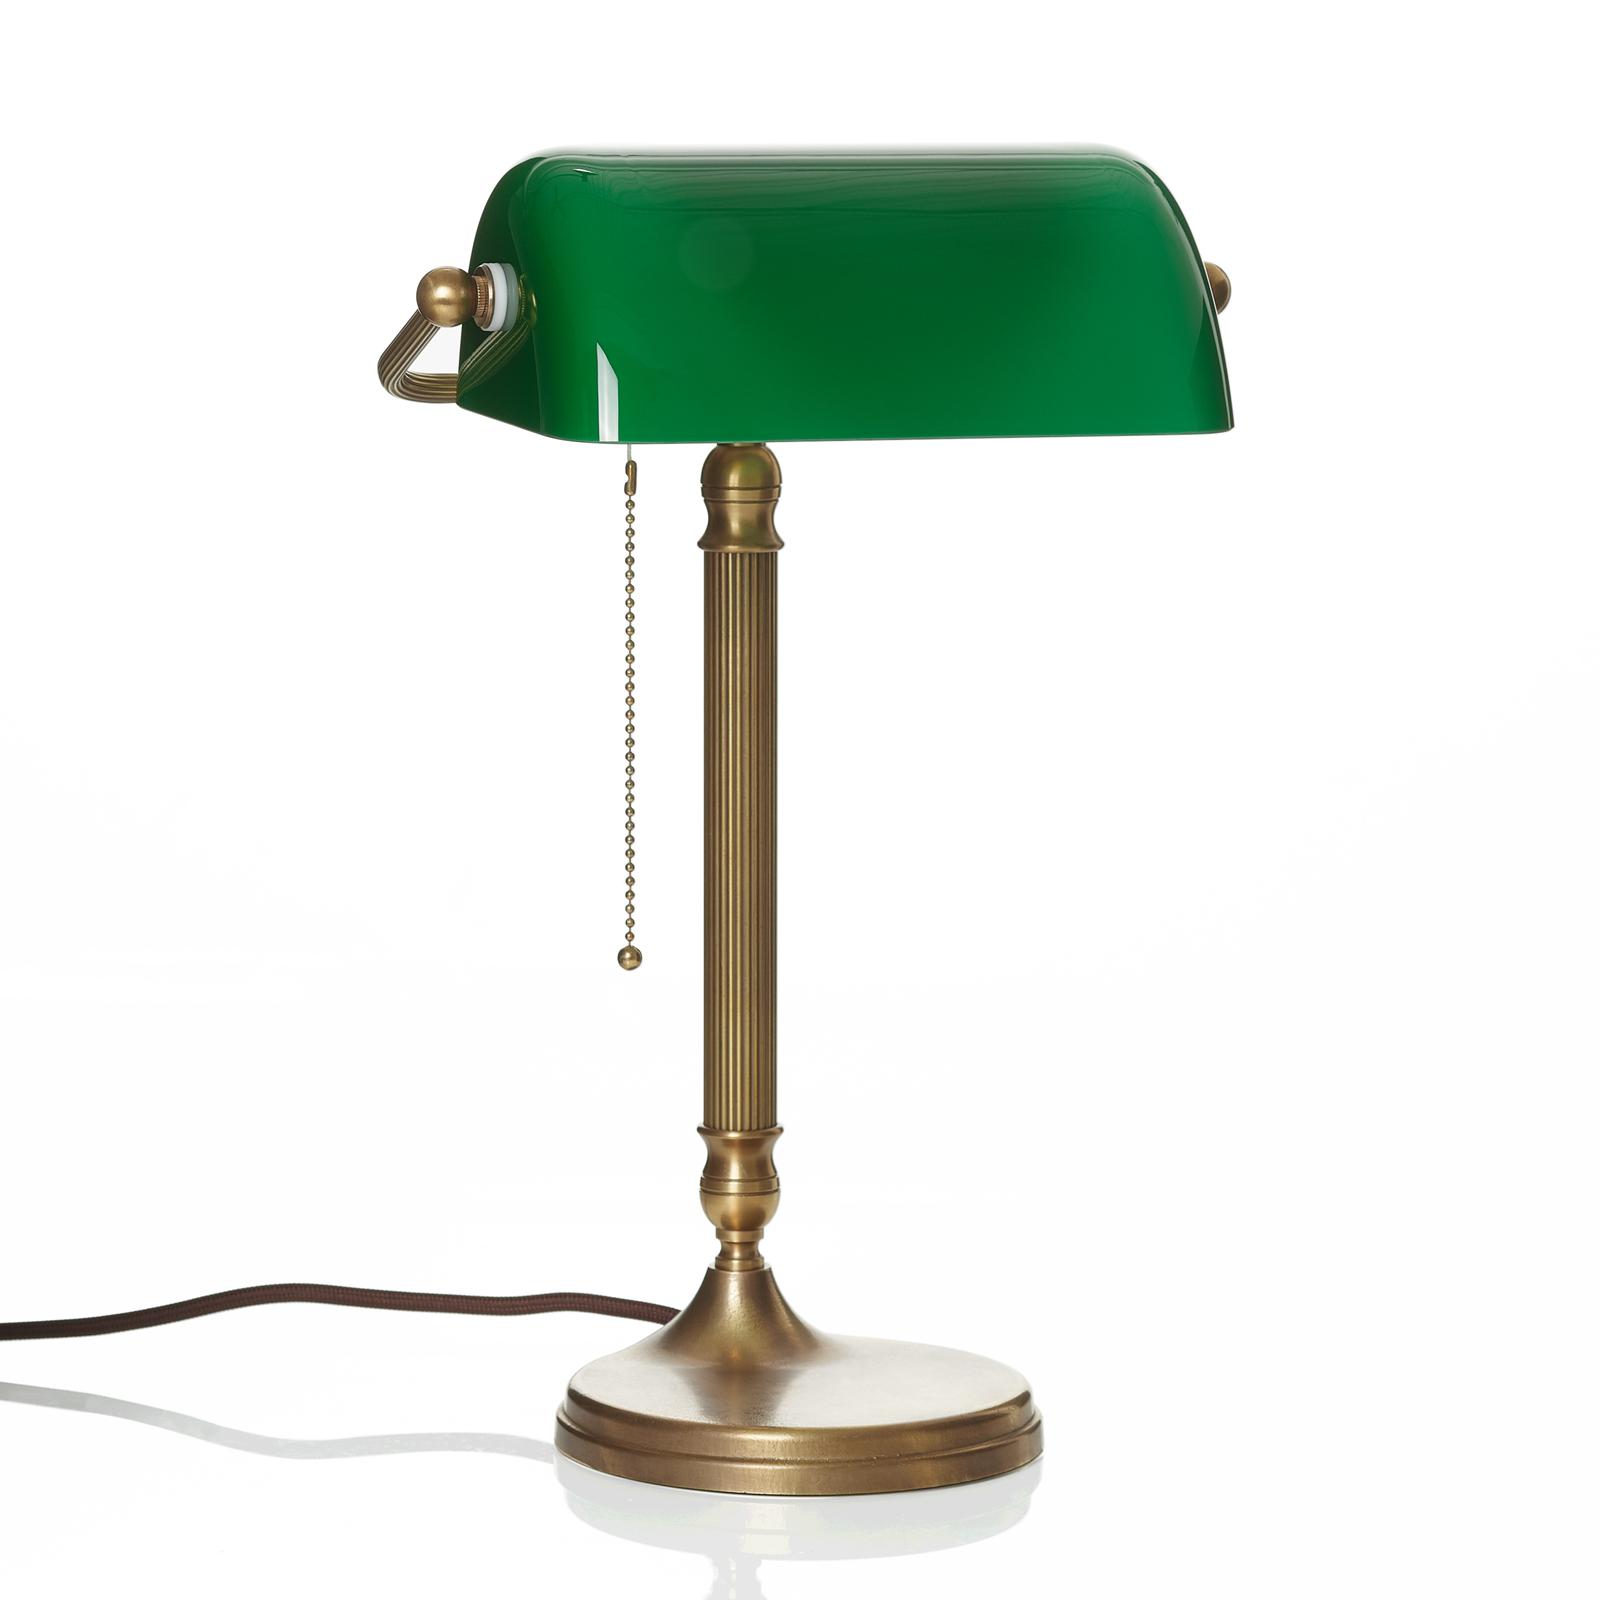 Handtillverkad banklampa JIVAN